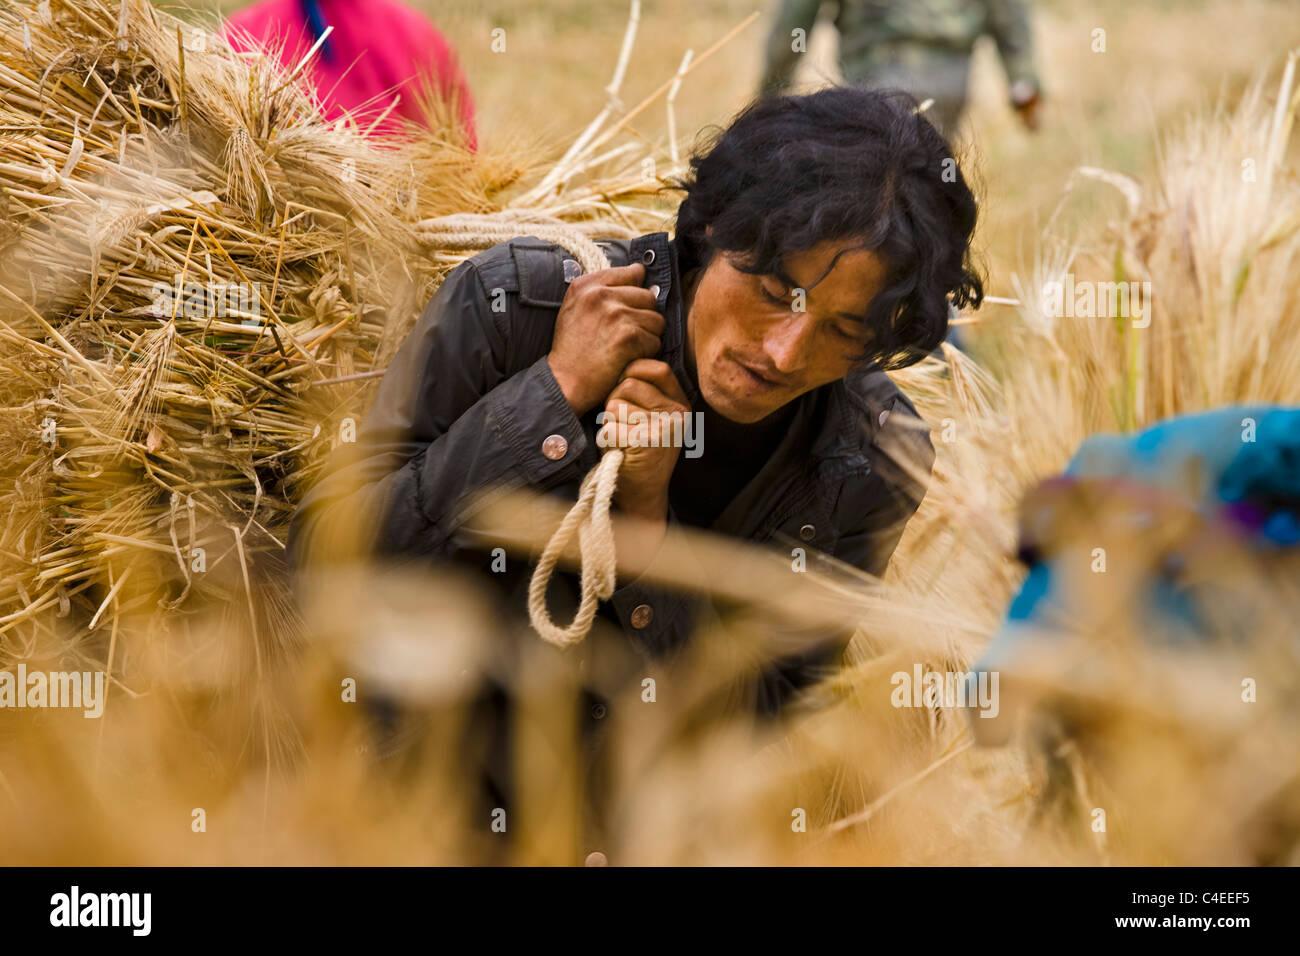 Carrying bales of cut barley harvest in Wu Ya village, eastern Tibet. China - Stock Image